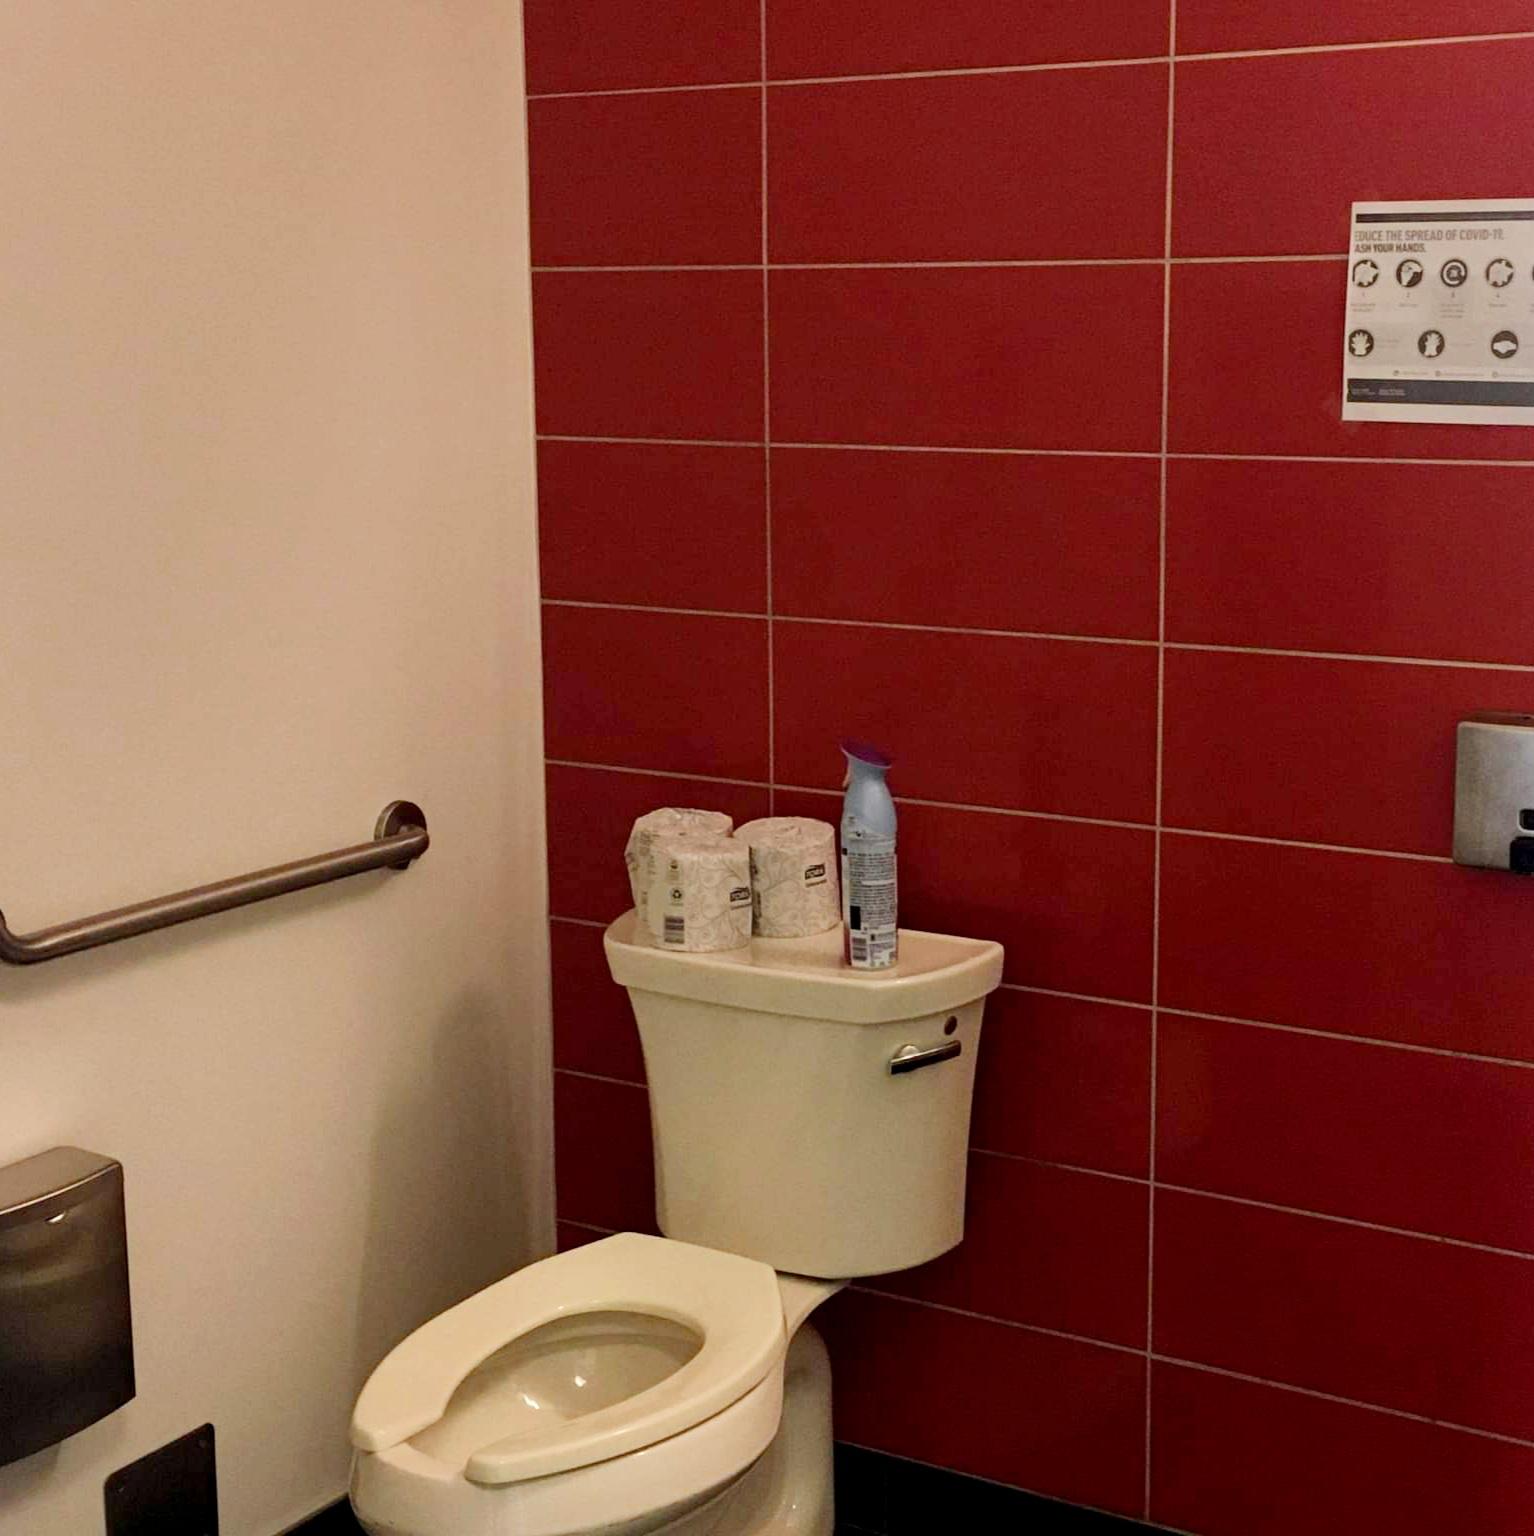 Vancouver accessible washroom